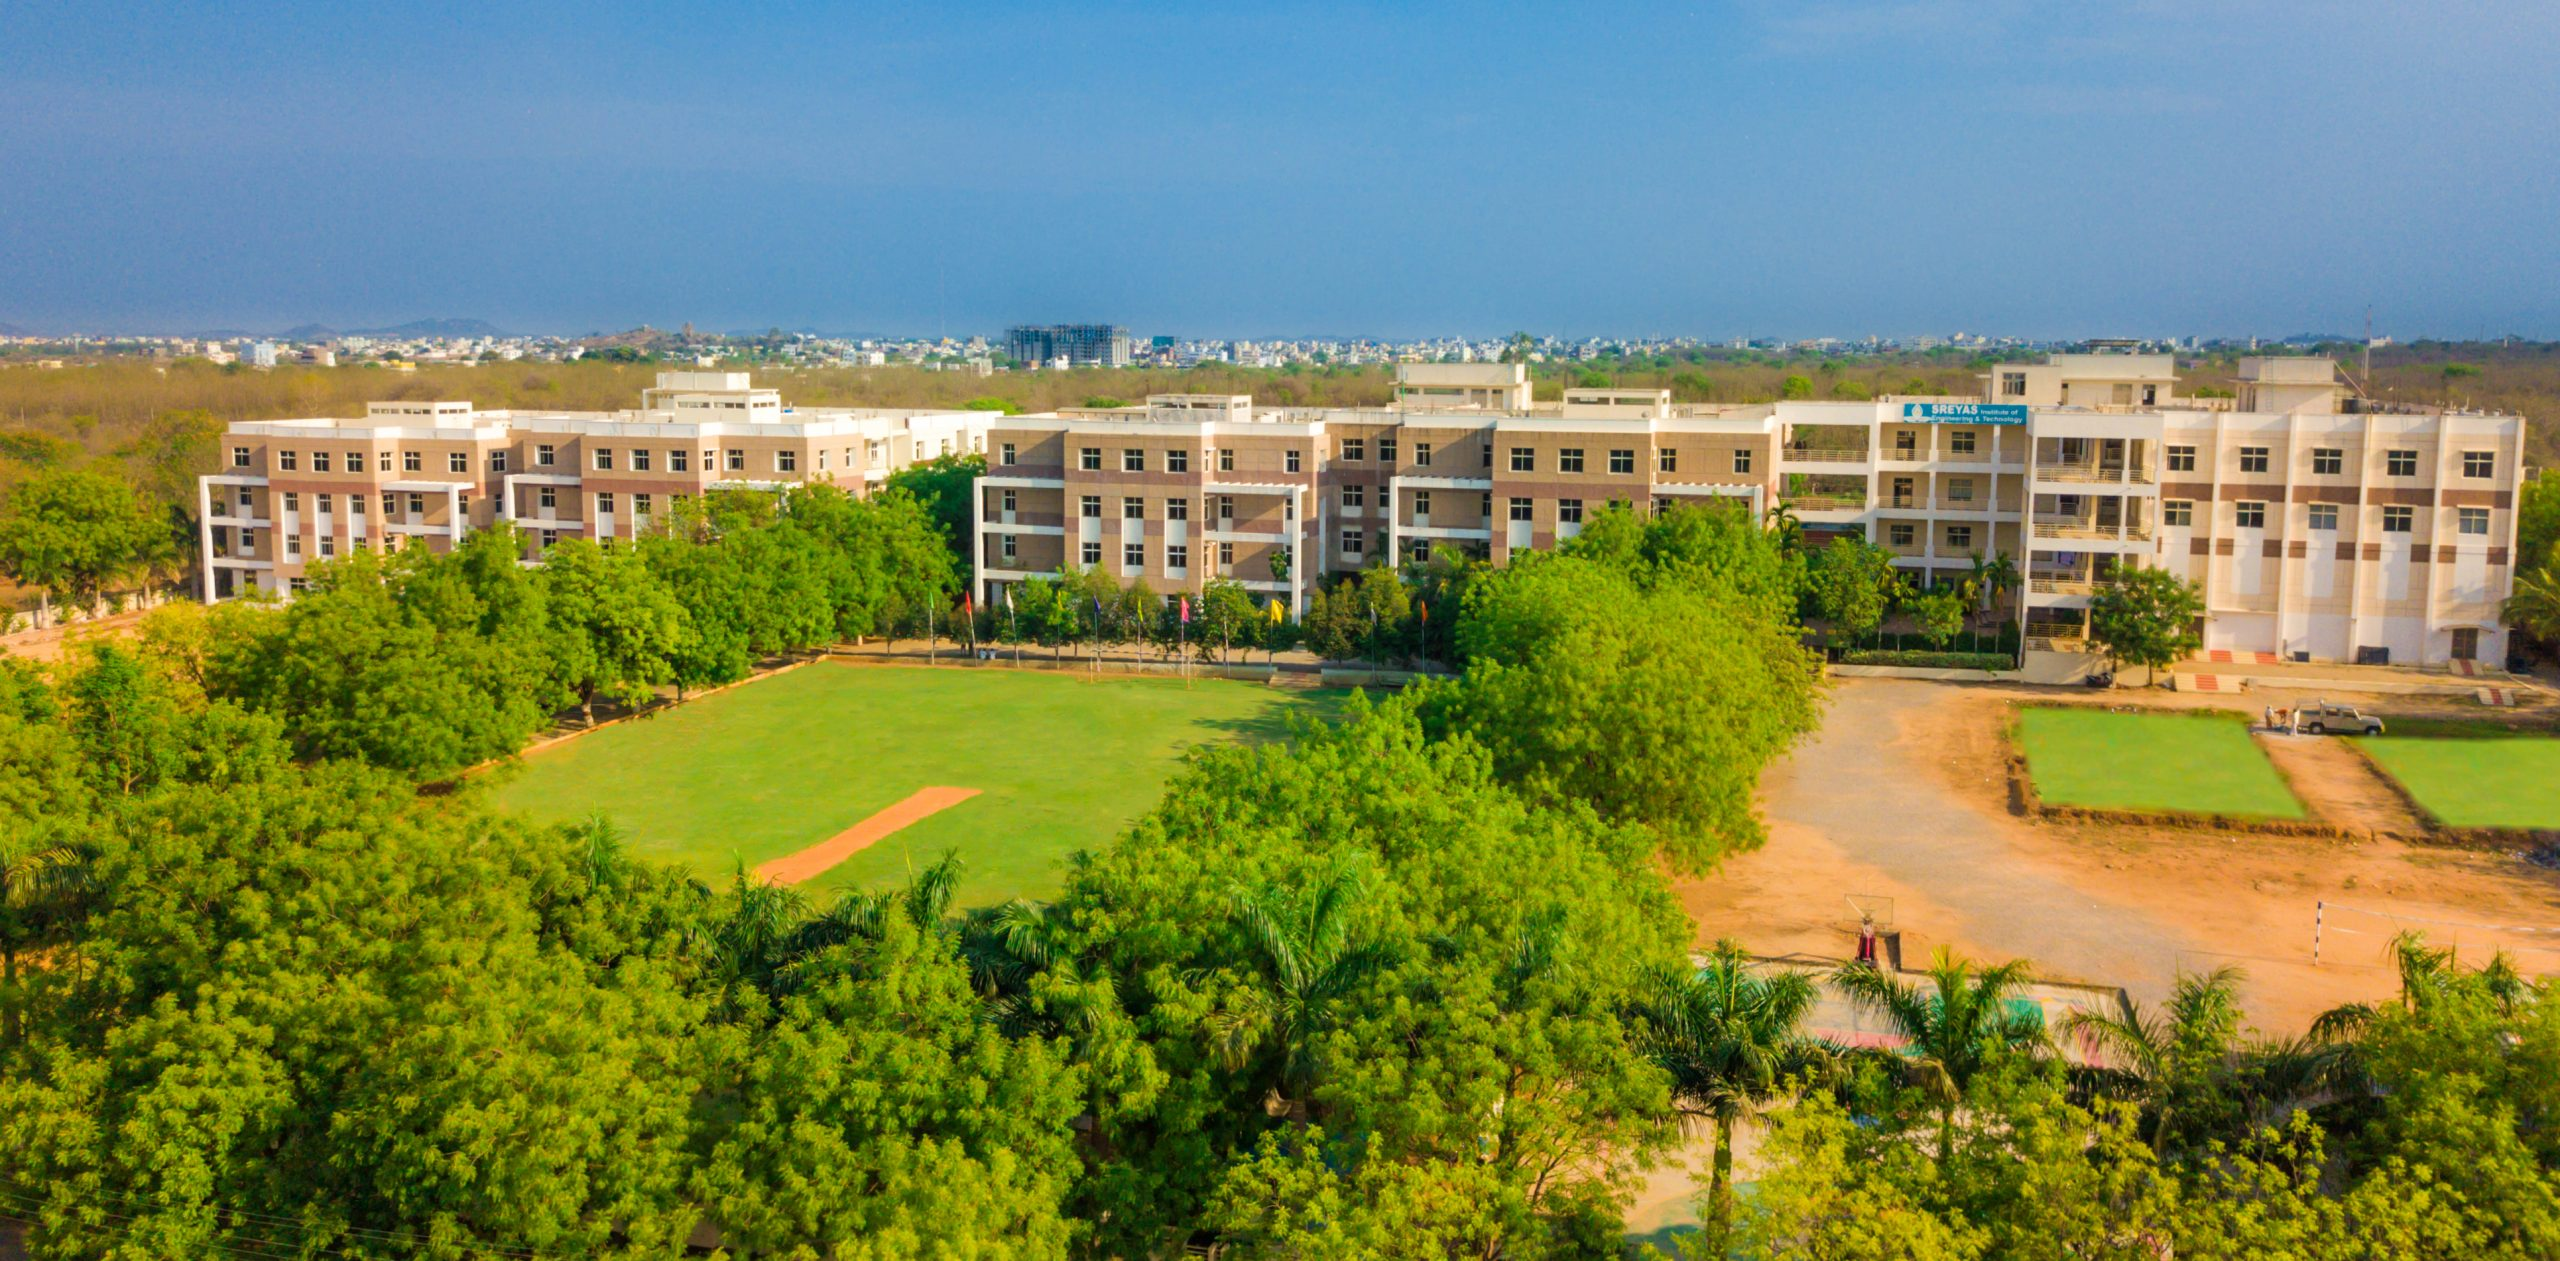 sreyas campus